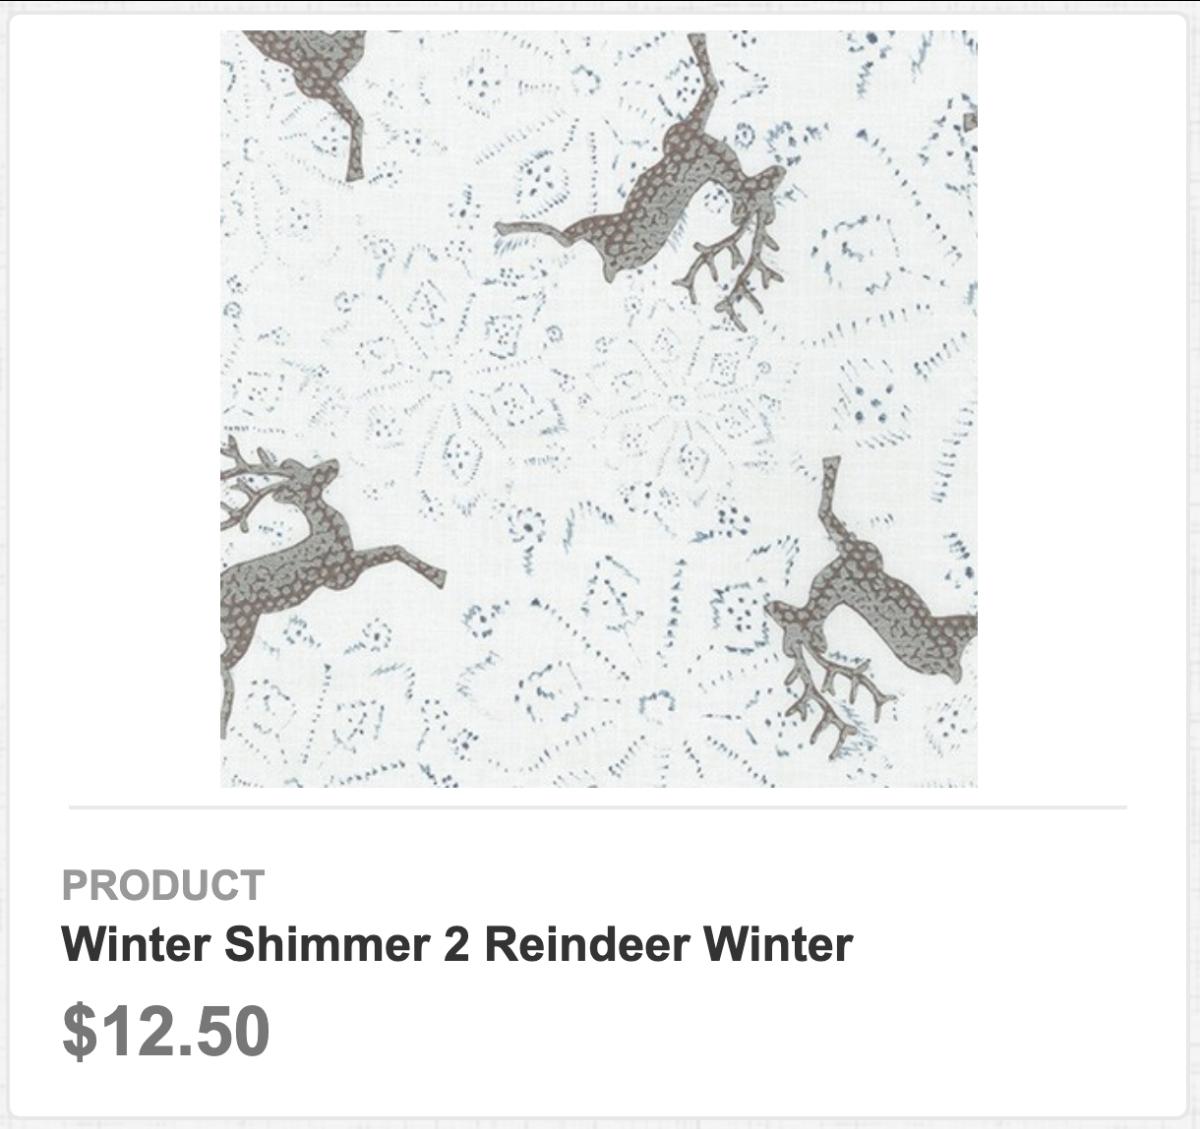 Winter Shimmer 2 Reindeer Winter